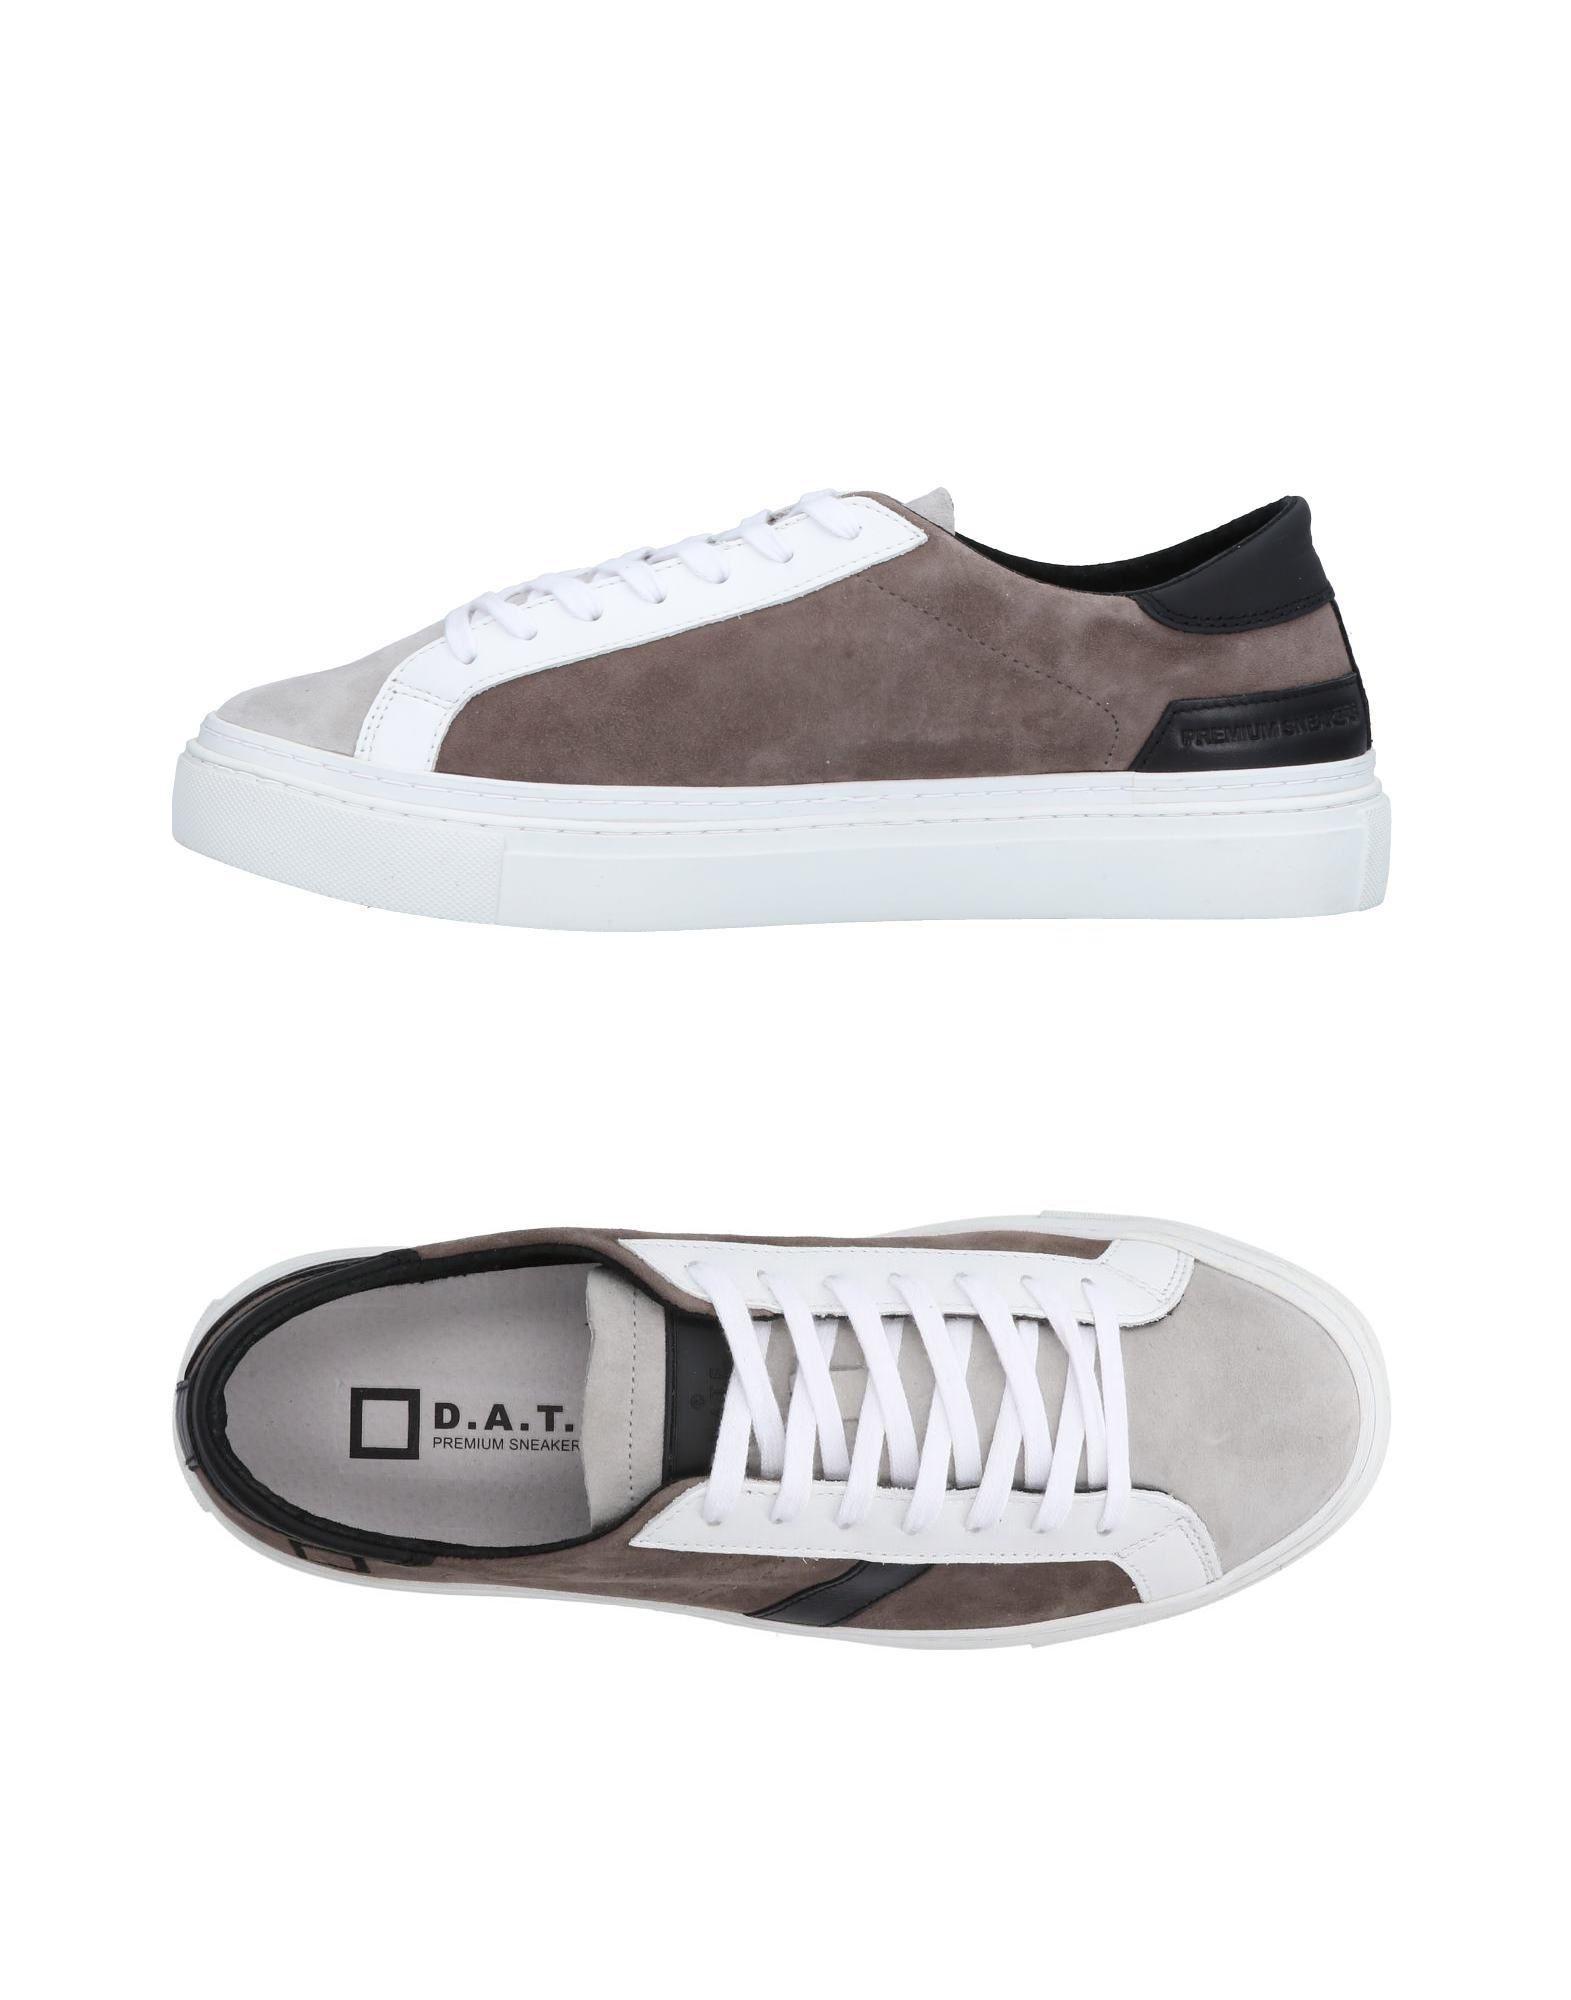 Moda Sneakers D.A.T.E. Uomo - 11491804OG